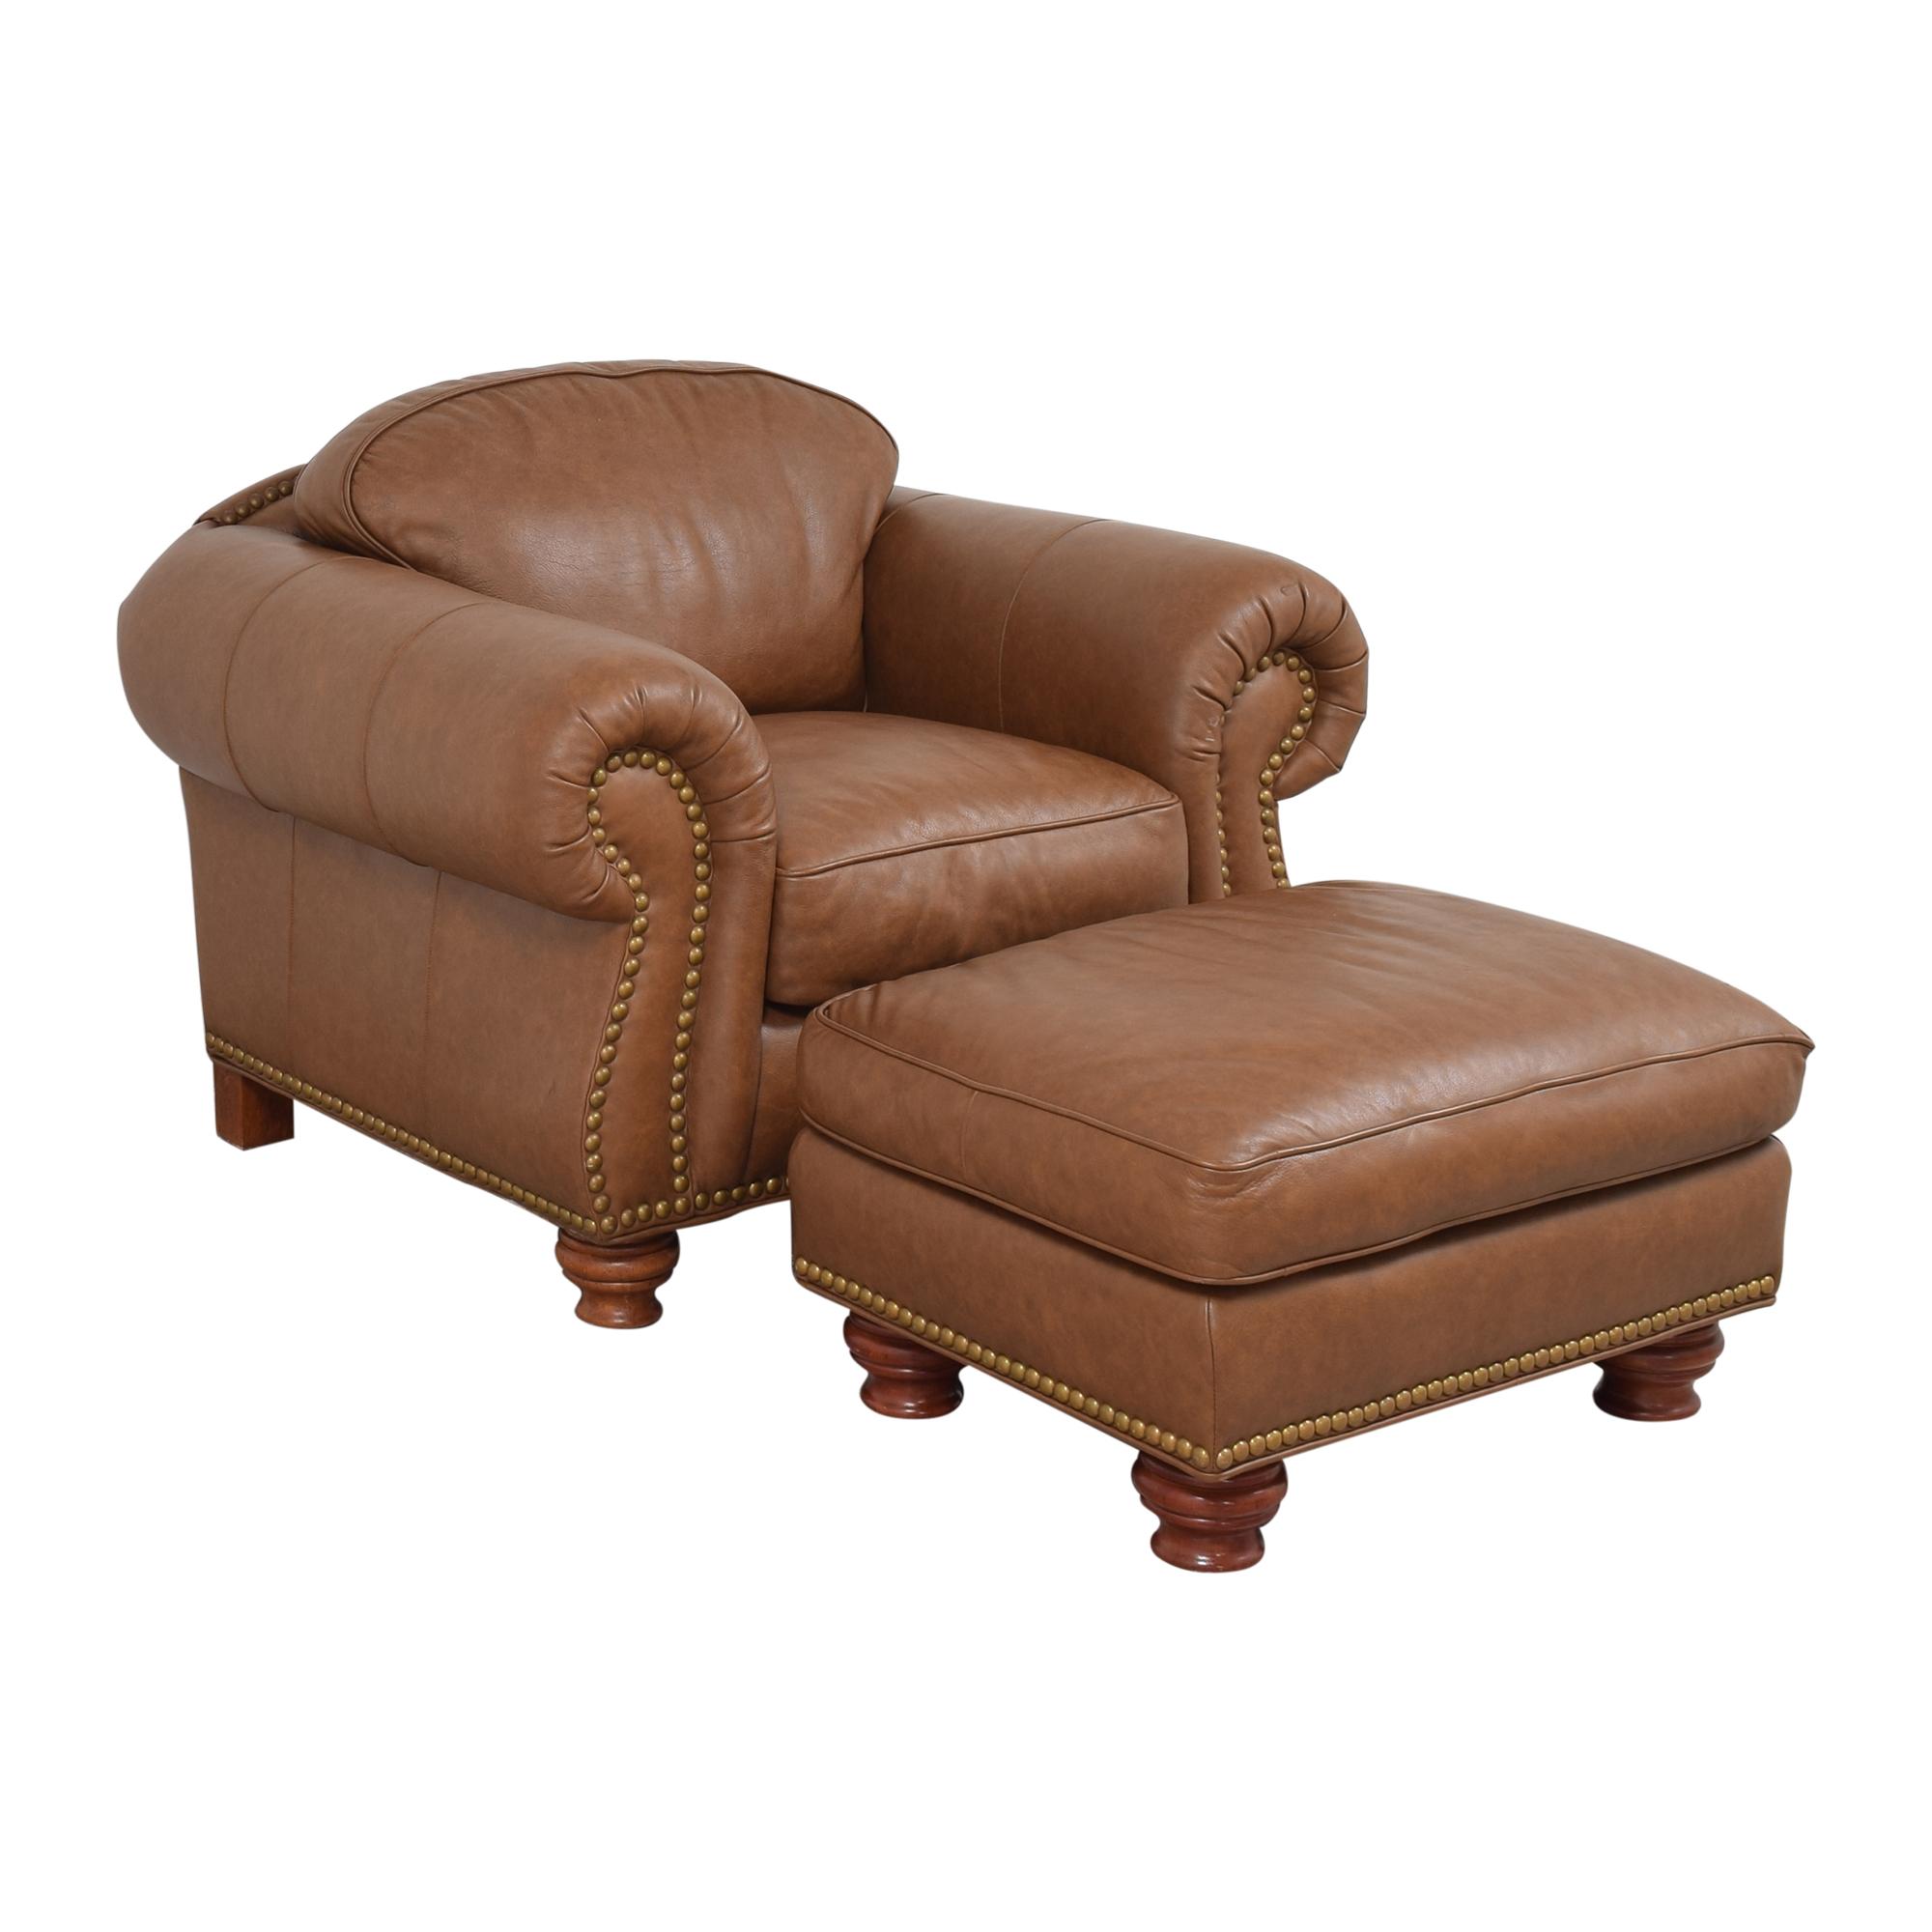 Thomasville Nailhead Club Chair with Ottoman sale